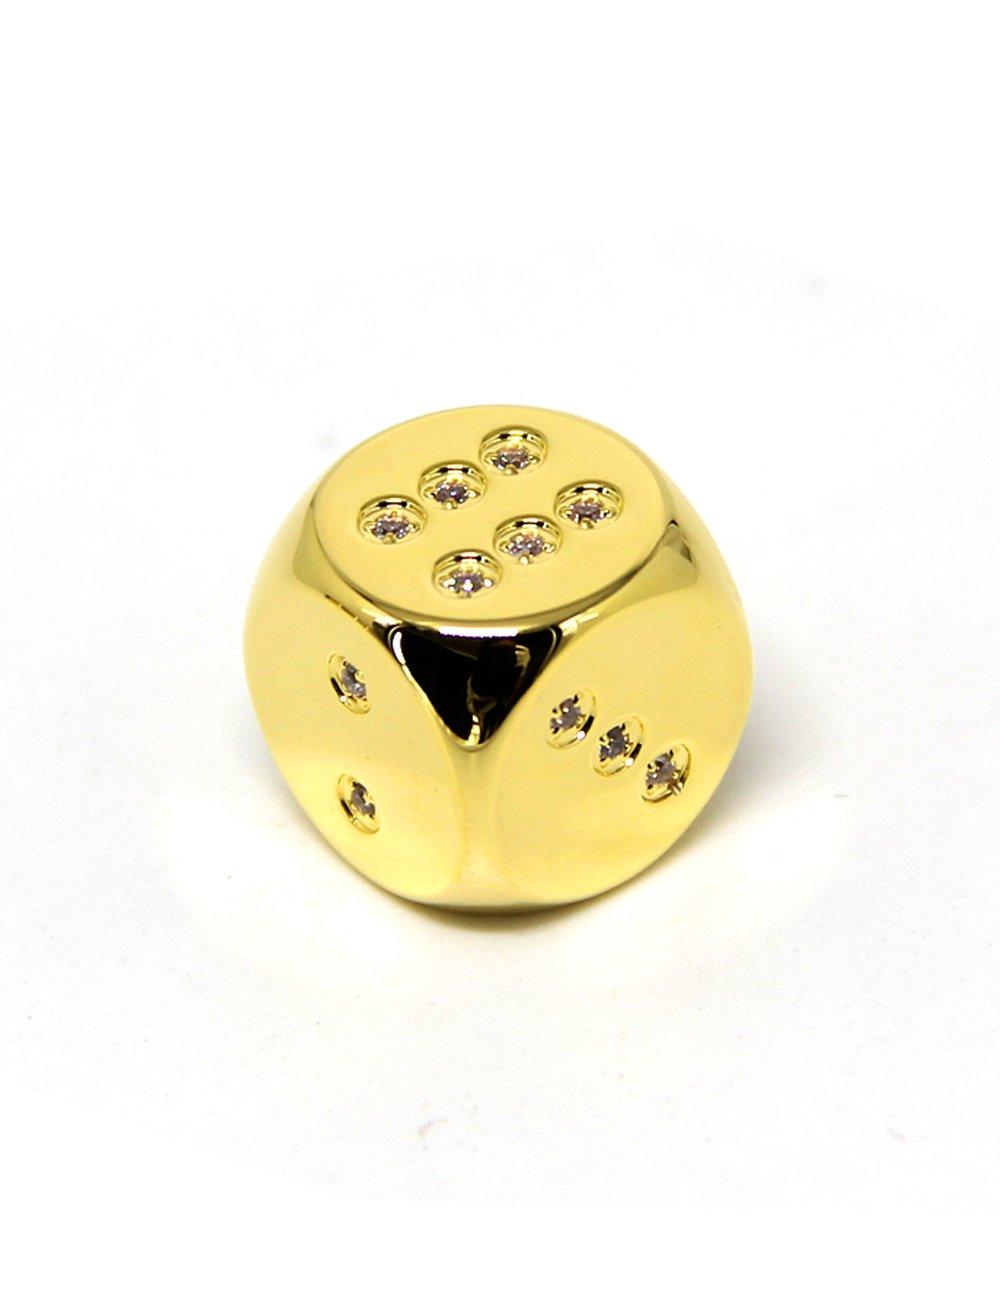 Callancity 5pcs handwork rhinestone diamonds encrusted 24kt real gold plated game custom dice